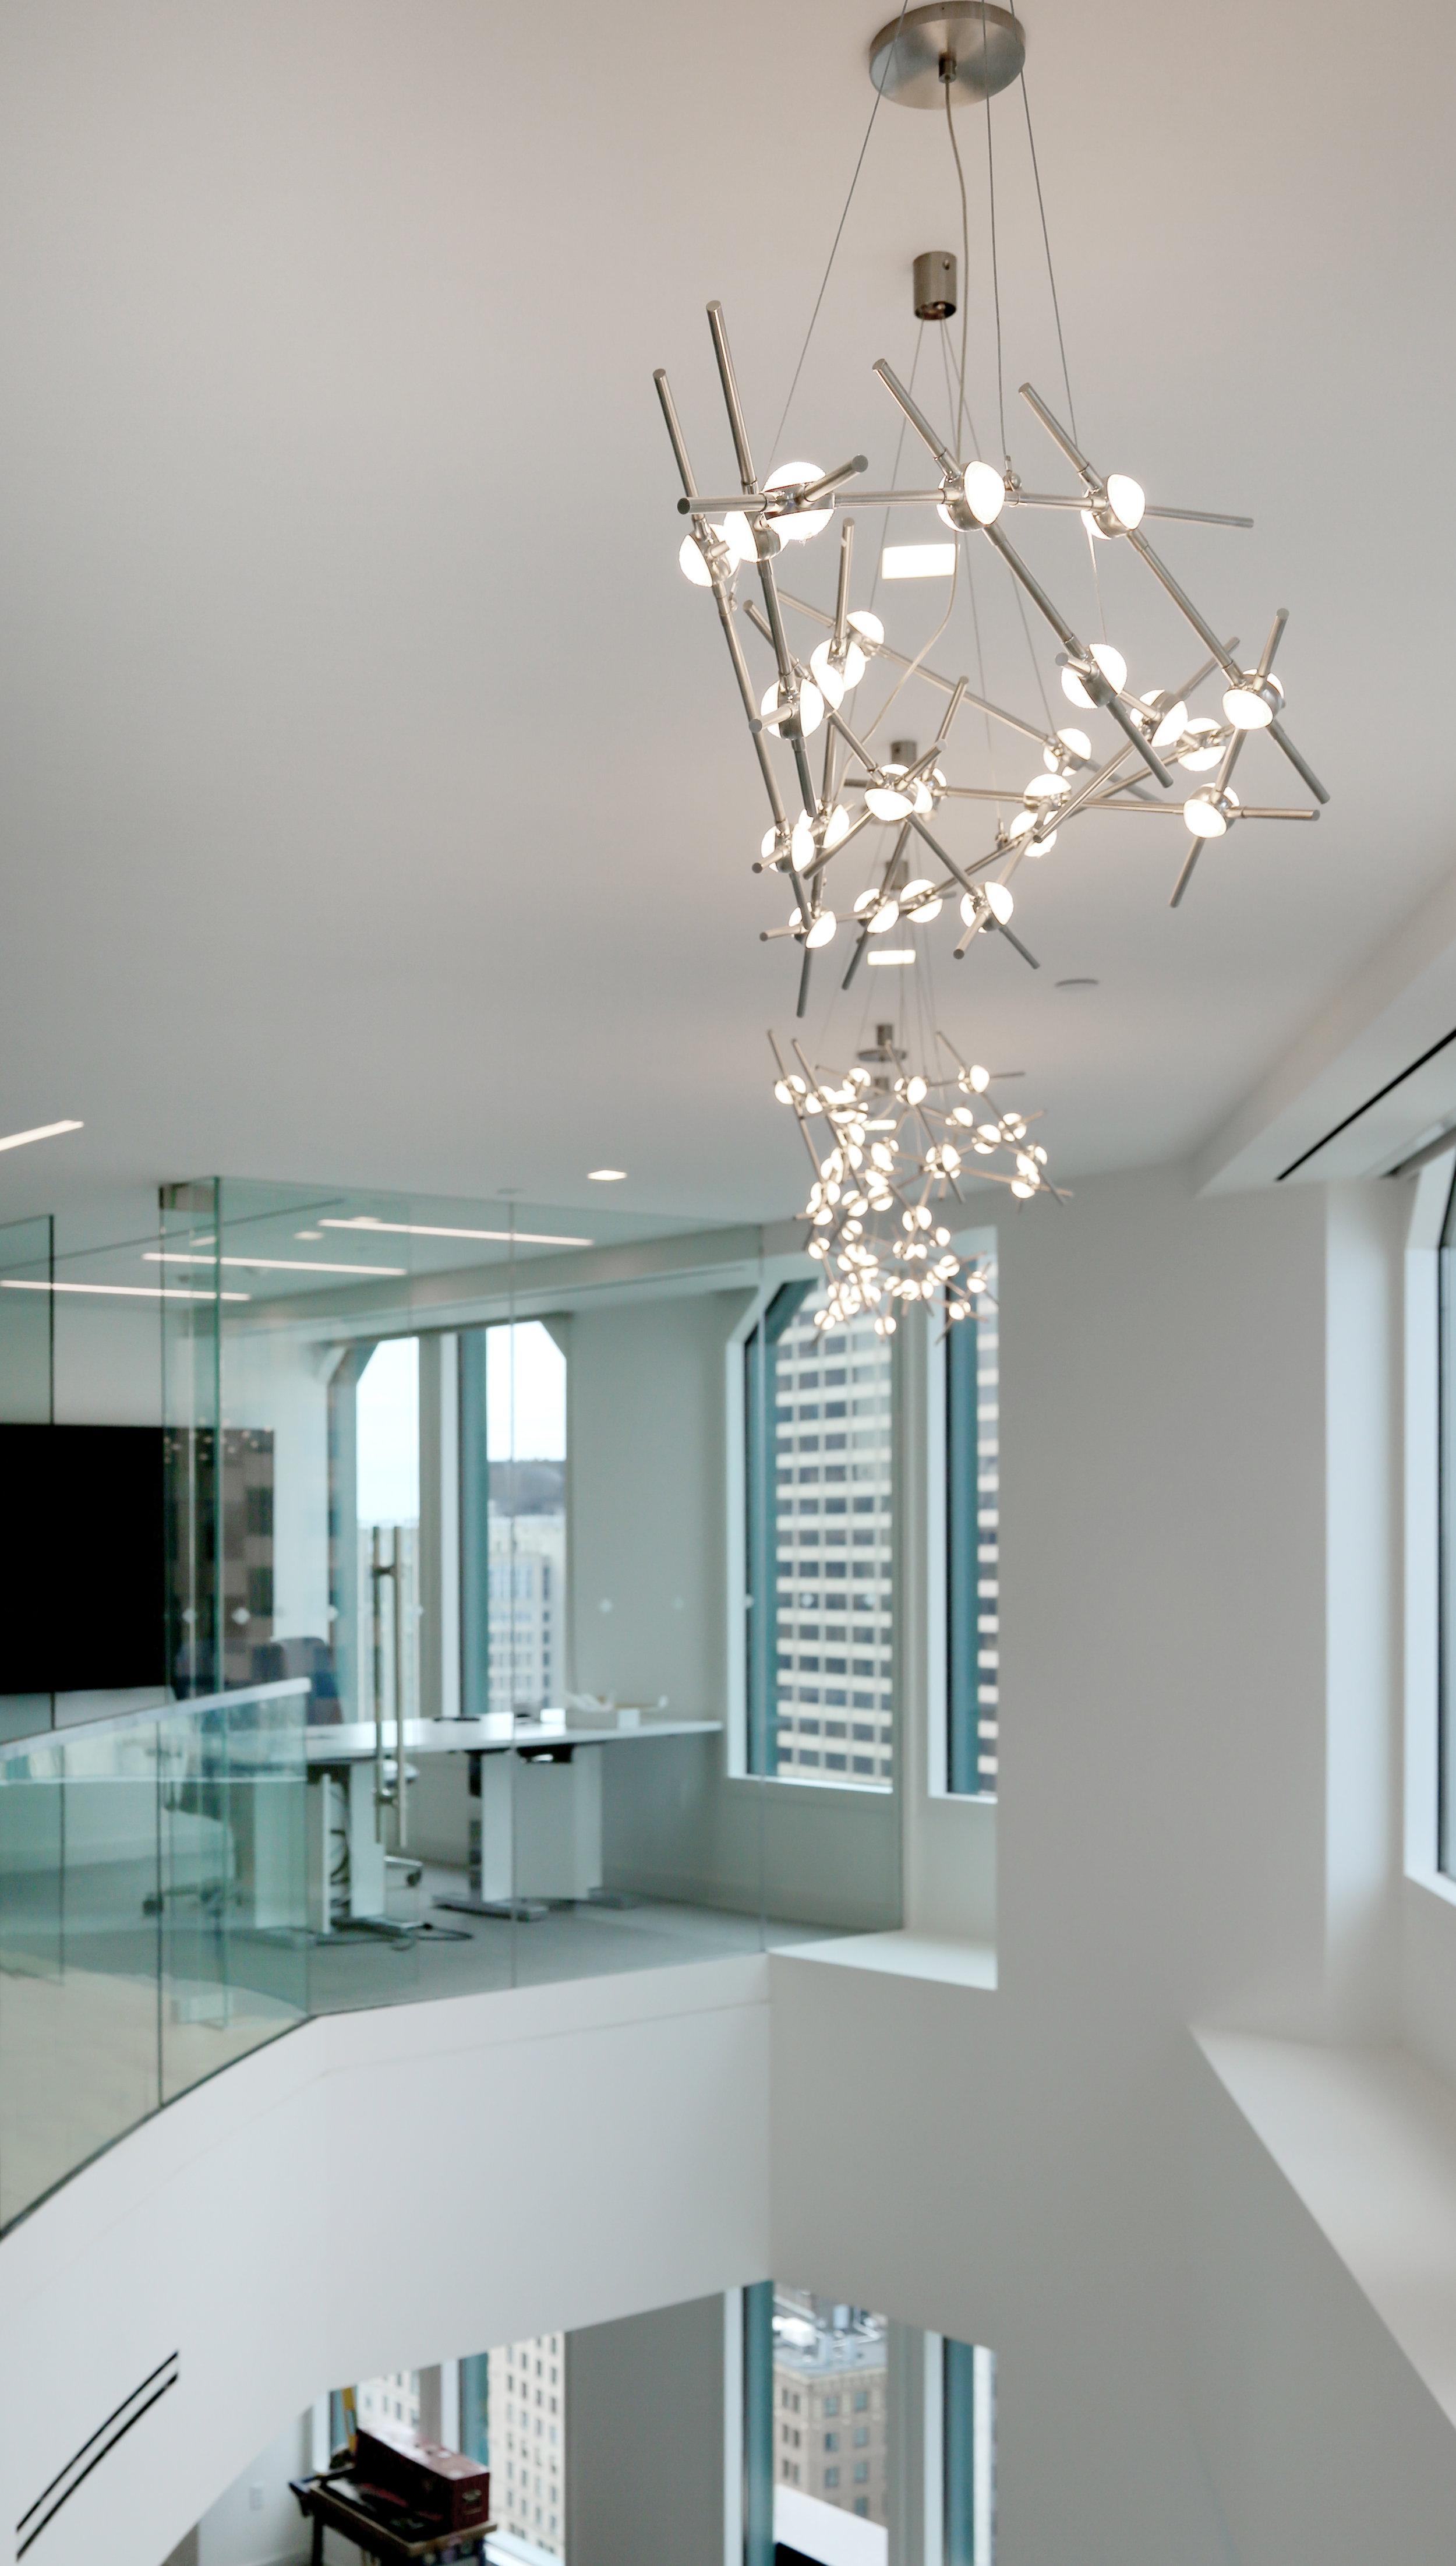 Frameless Glass Floating Office Wall - Spaceworks AI.jpg